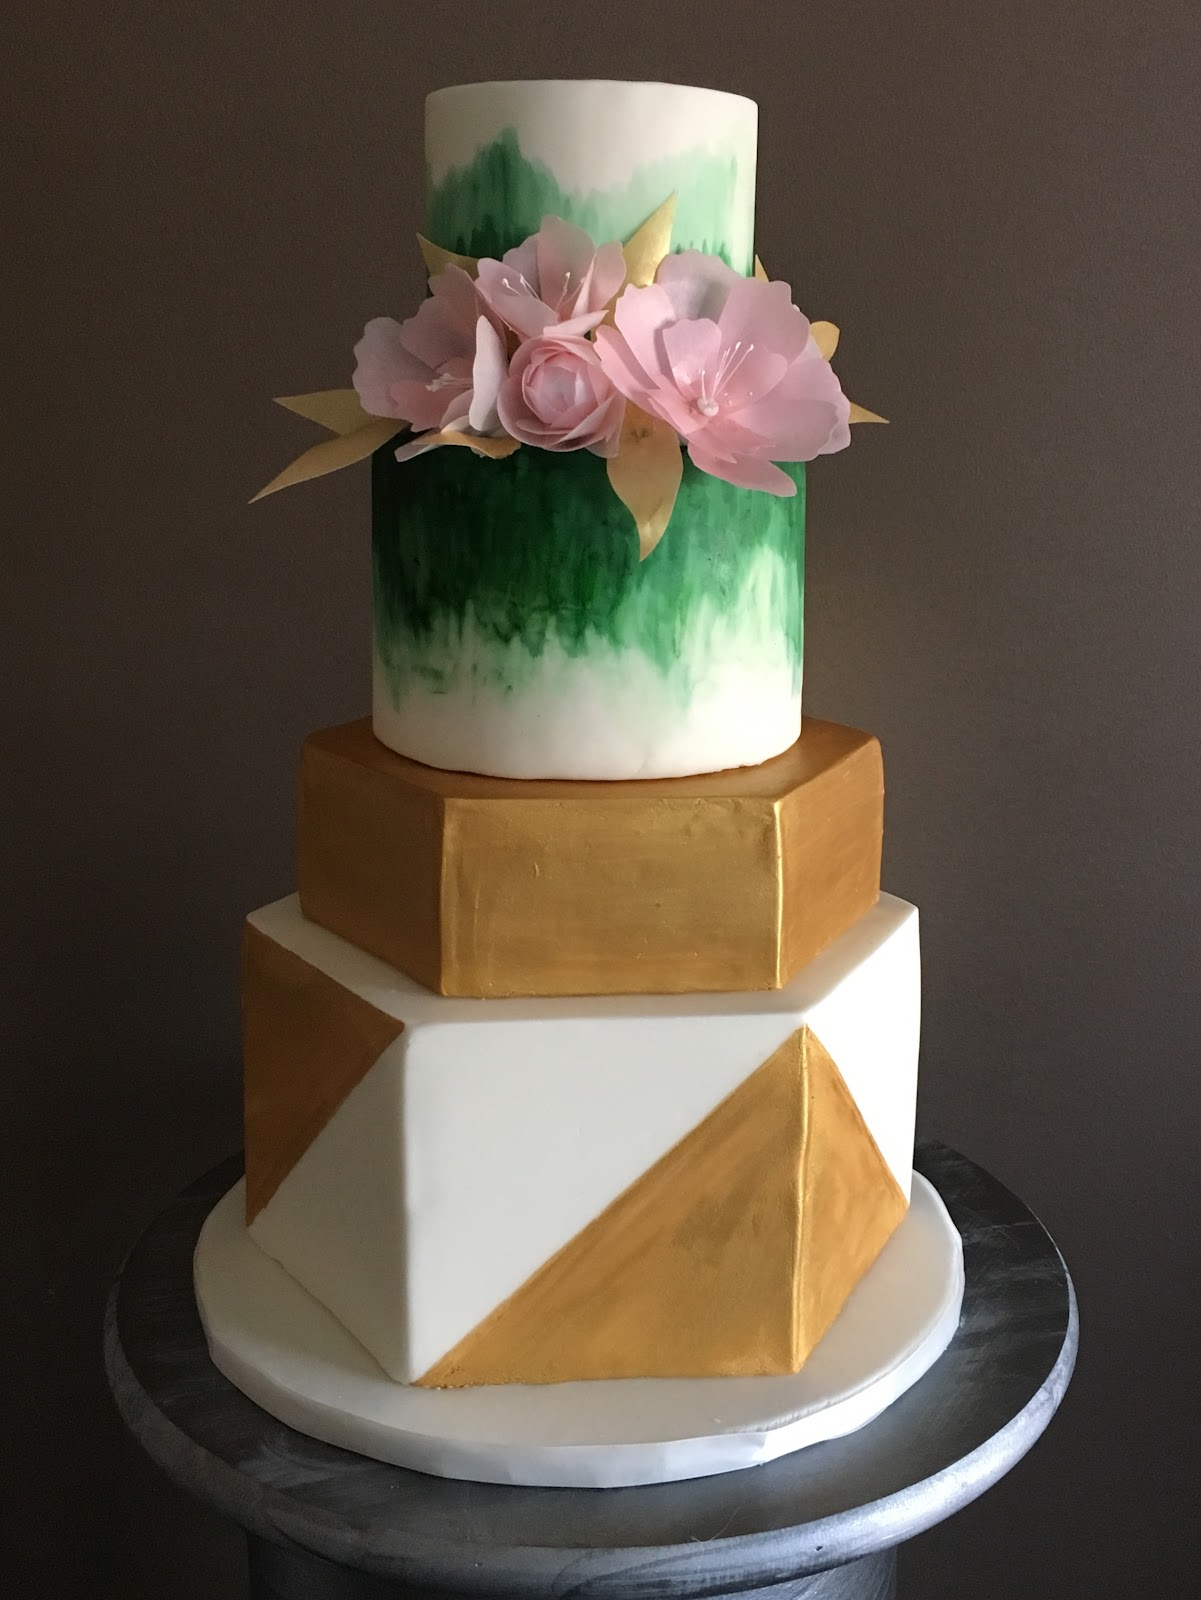 Zingerman's Bakehouse Wedding Cakes